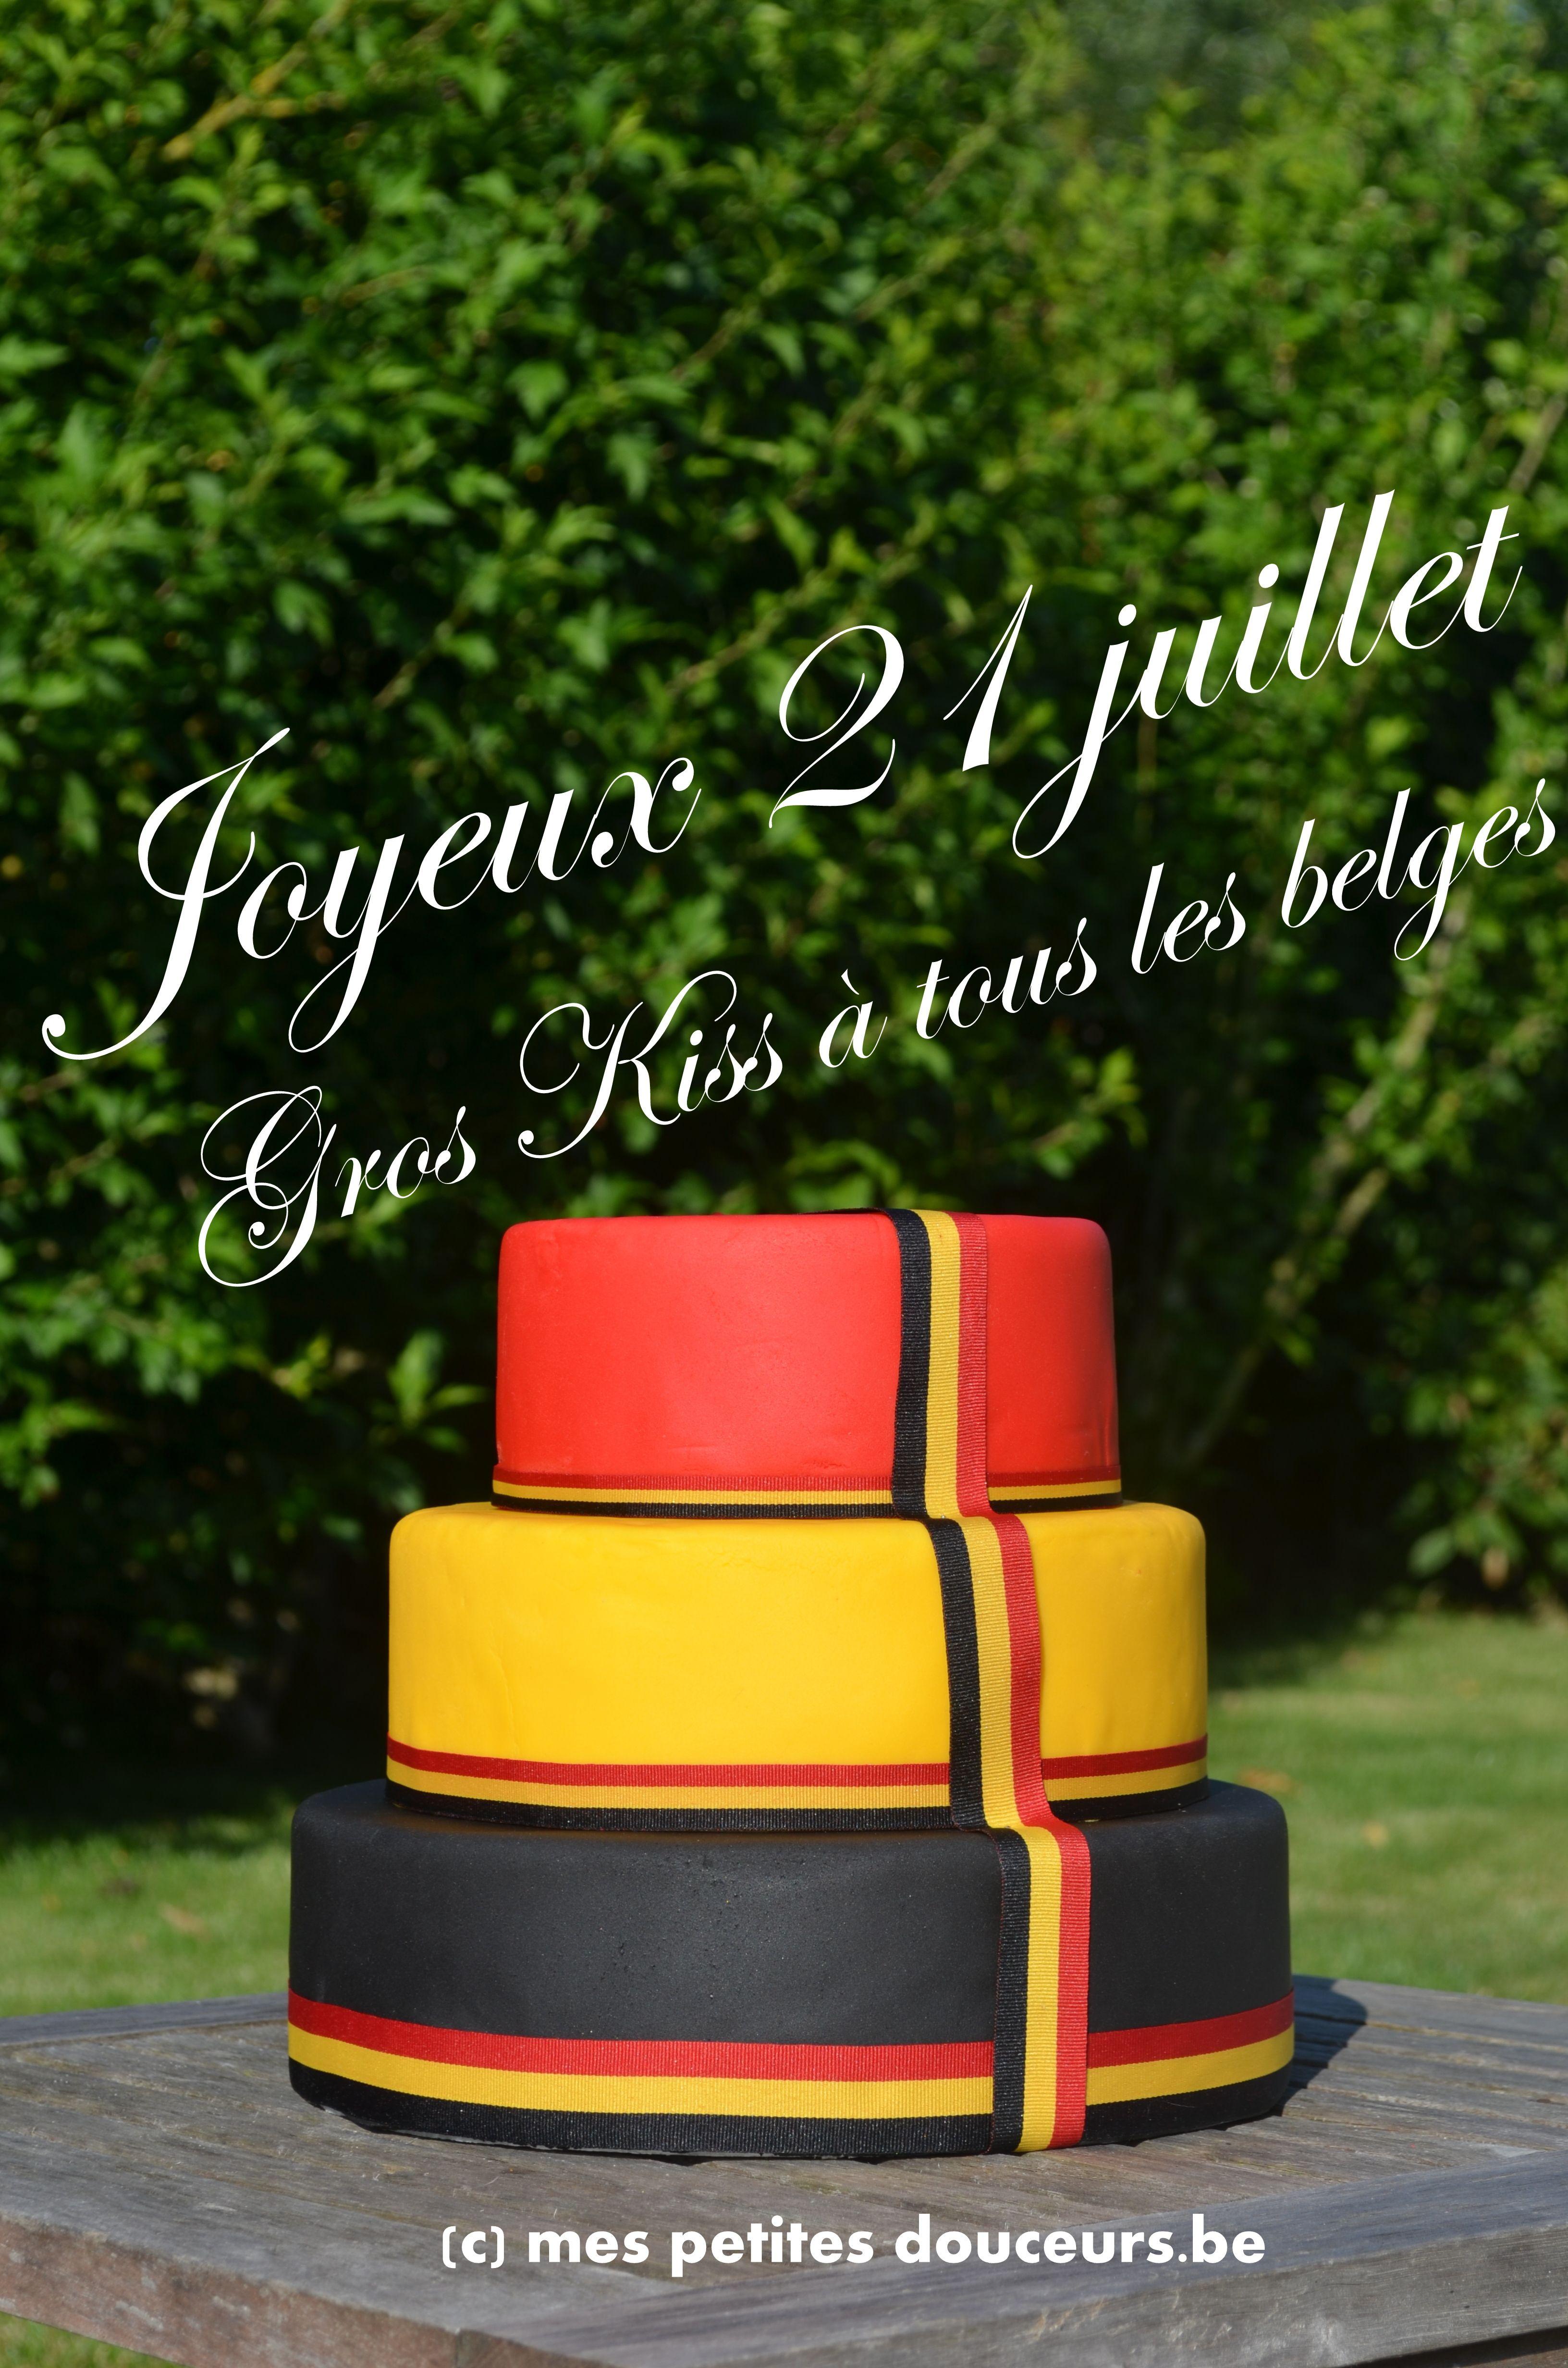 Belgian Flag Cake - 21th July Black, red, yellow